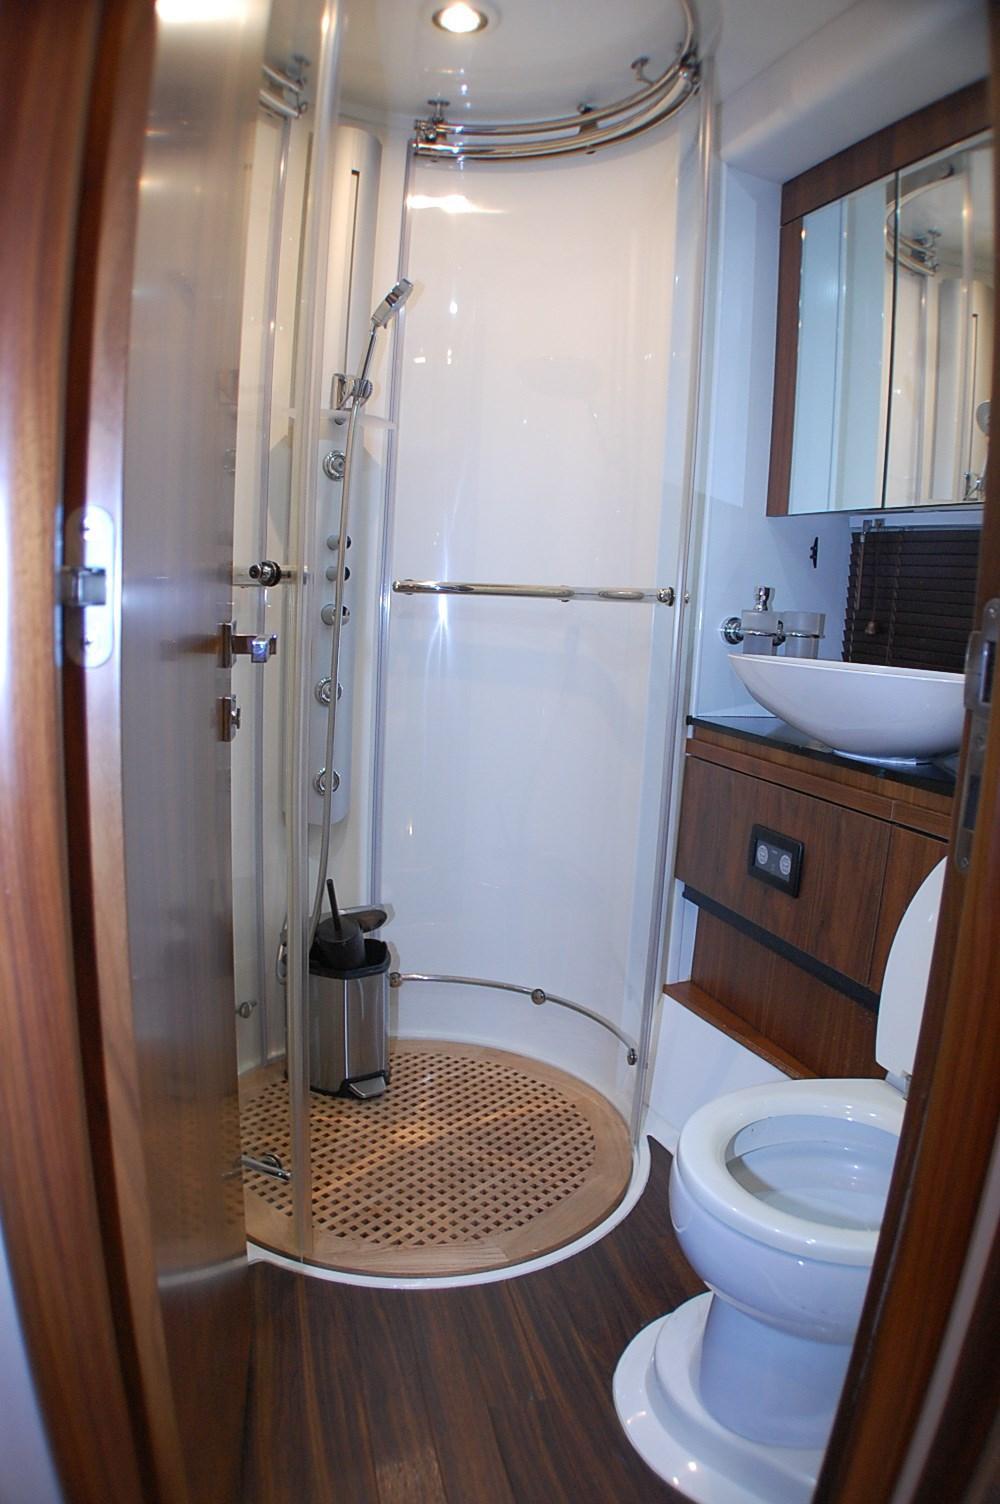 Magnificent 60 Shower Doors Gift - Bathtub Design Ideas - klotsnet.com